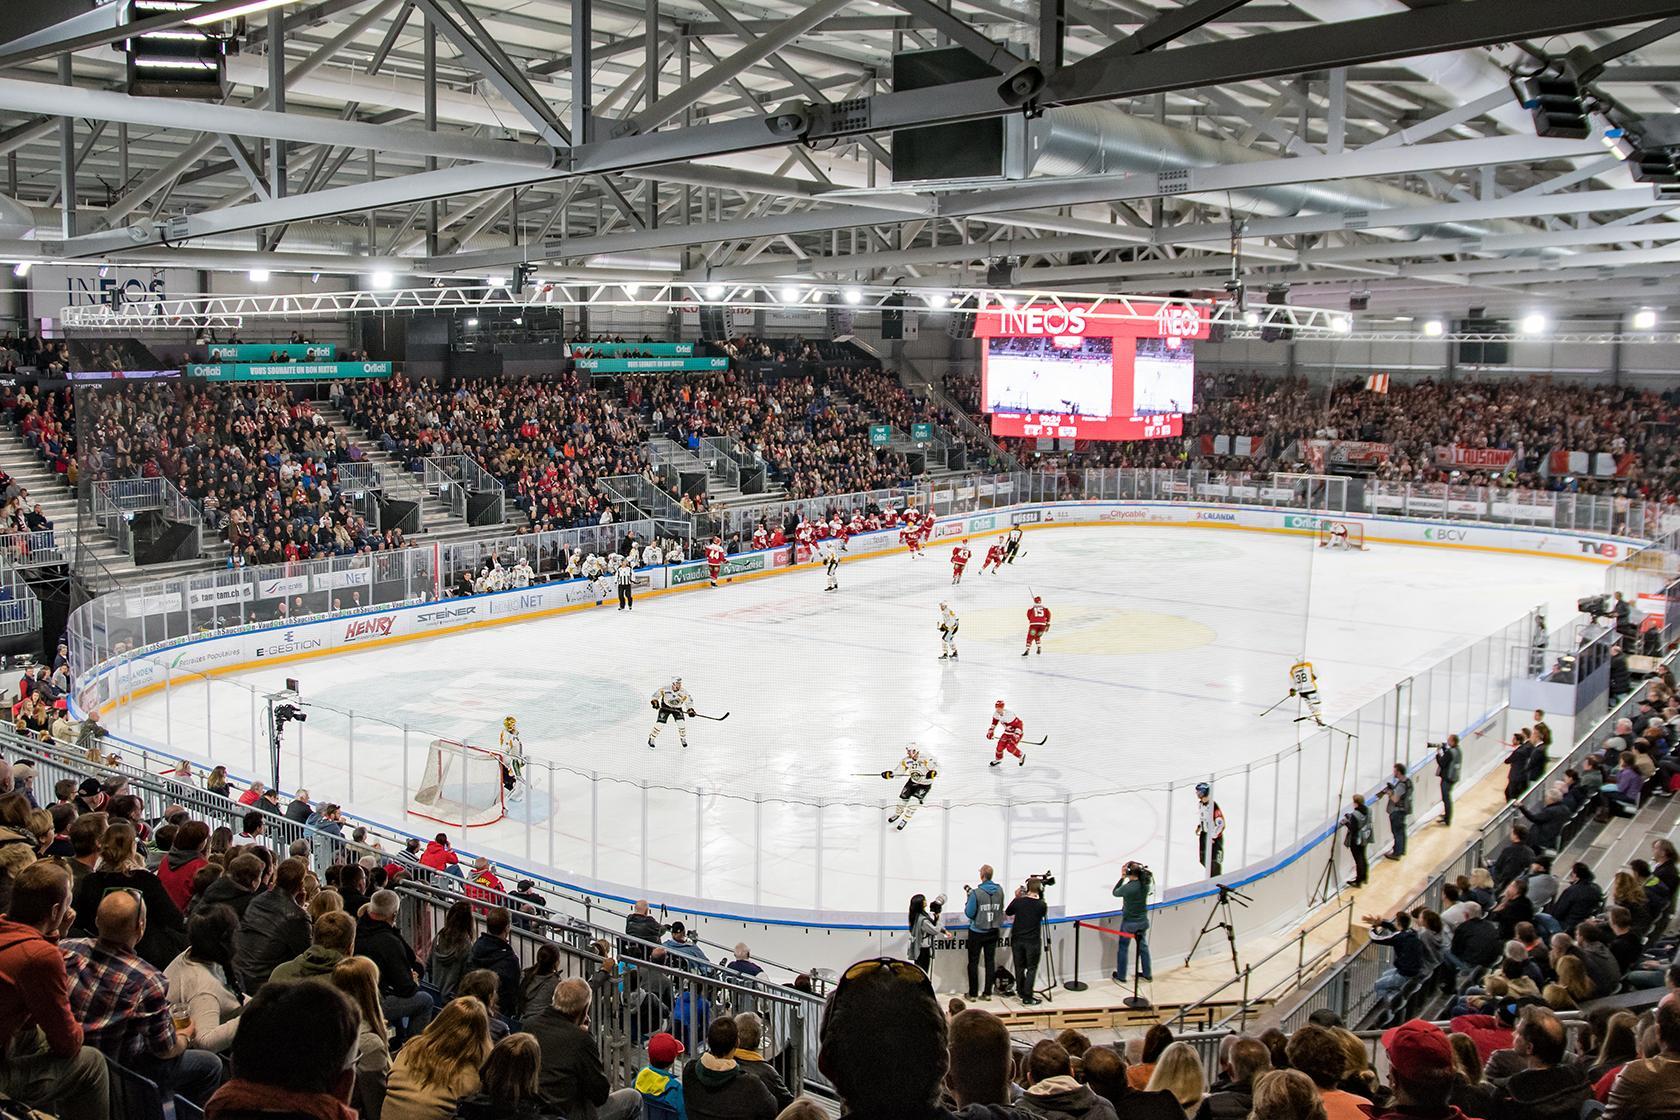 Eishockey Stadion Nürnberg